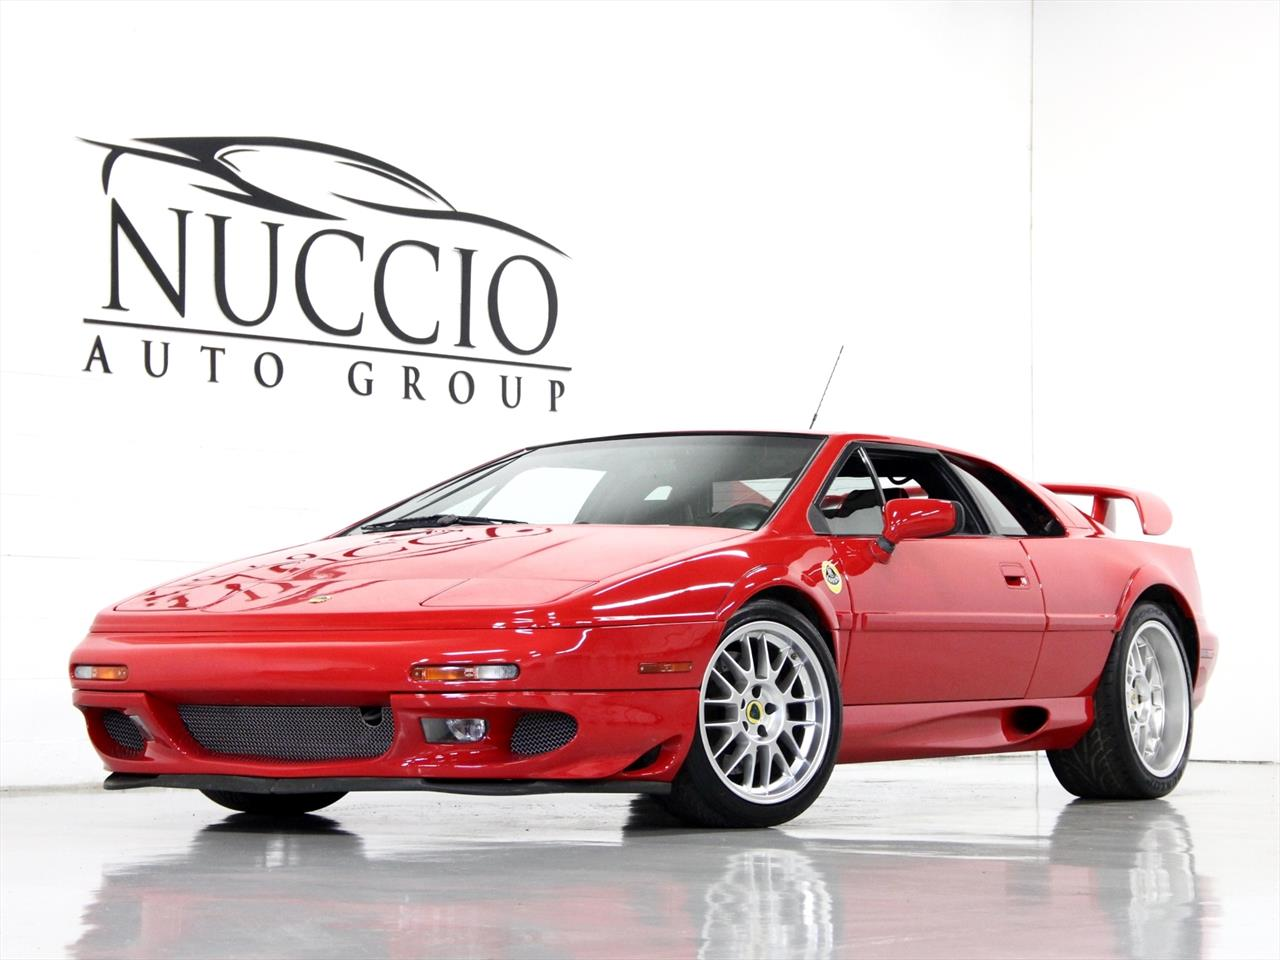 2004 Lotus Esprit V8 Final Edition